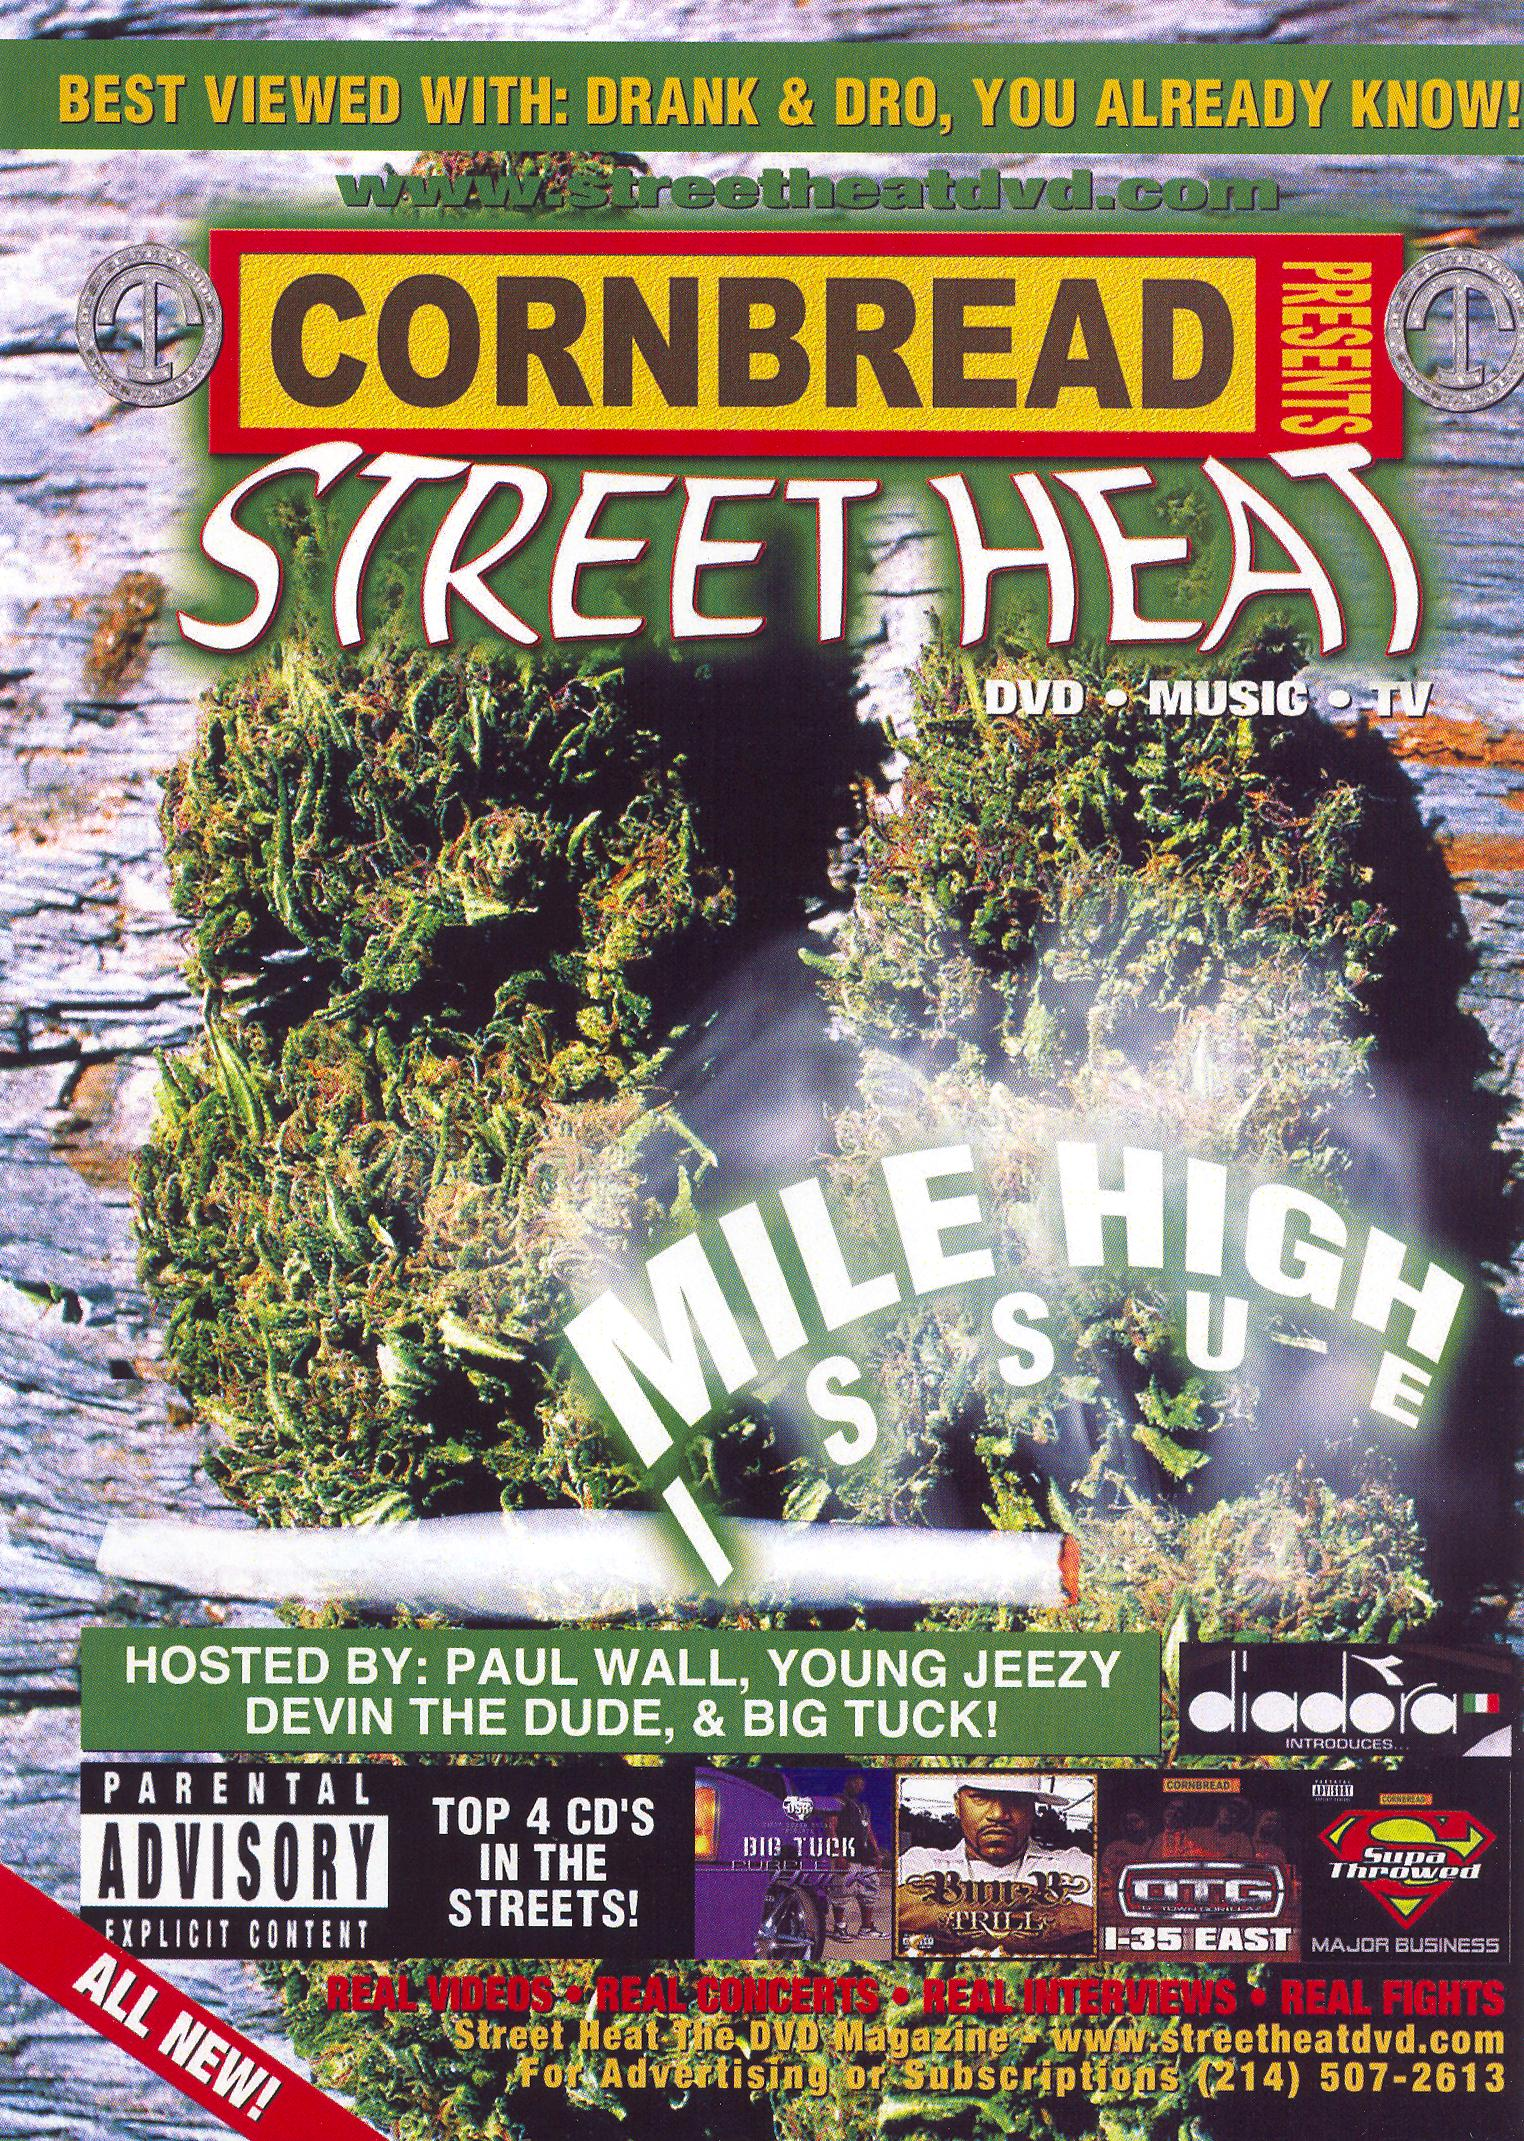 Cornbread Presents Street Heat: Mile High